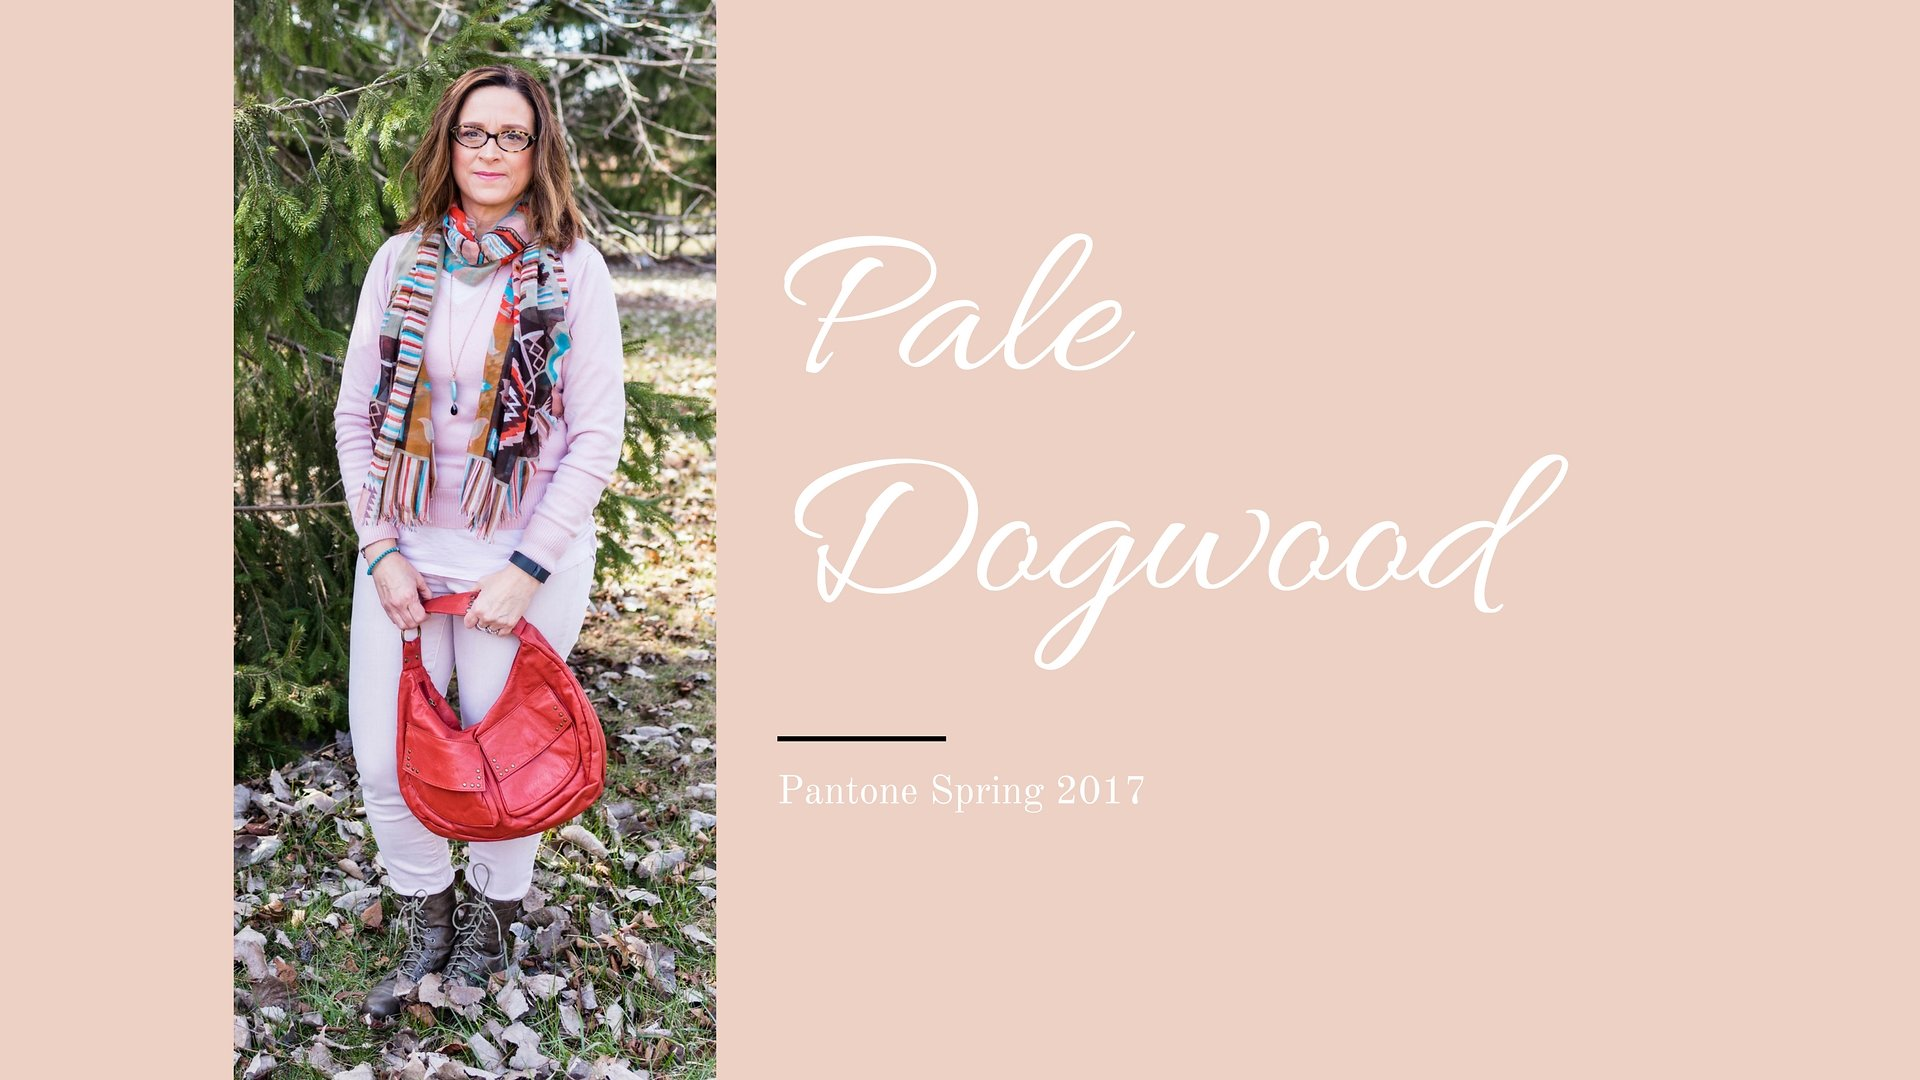 pale dogwood - Pantone Spring 2017